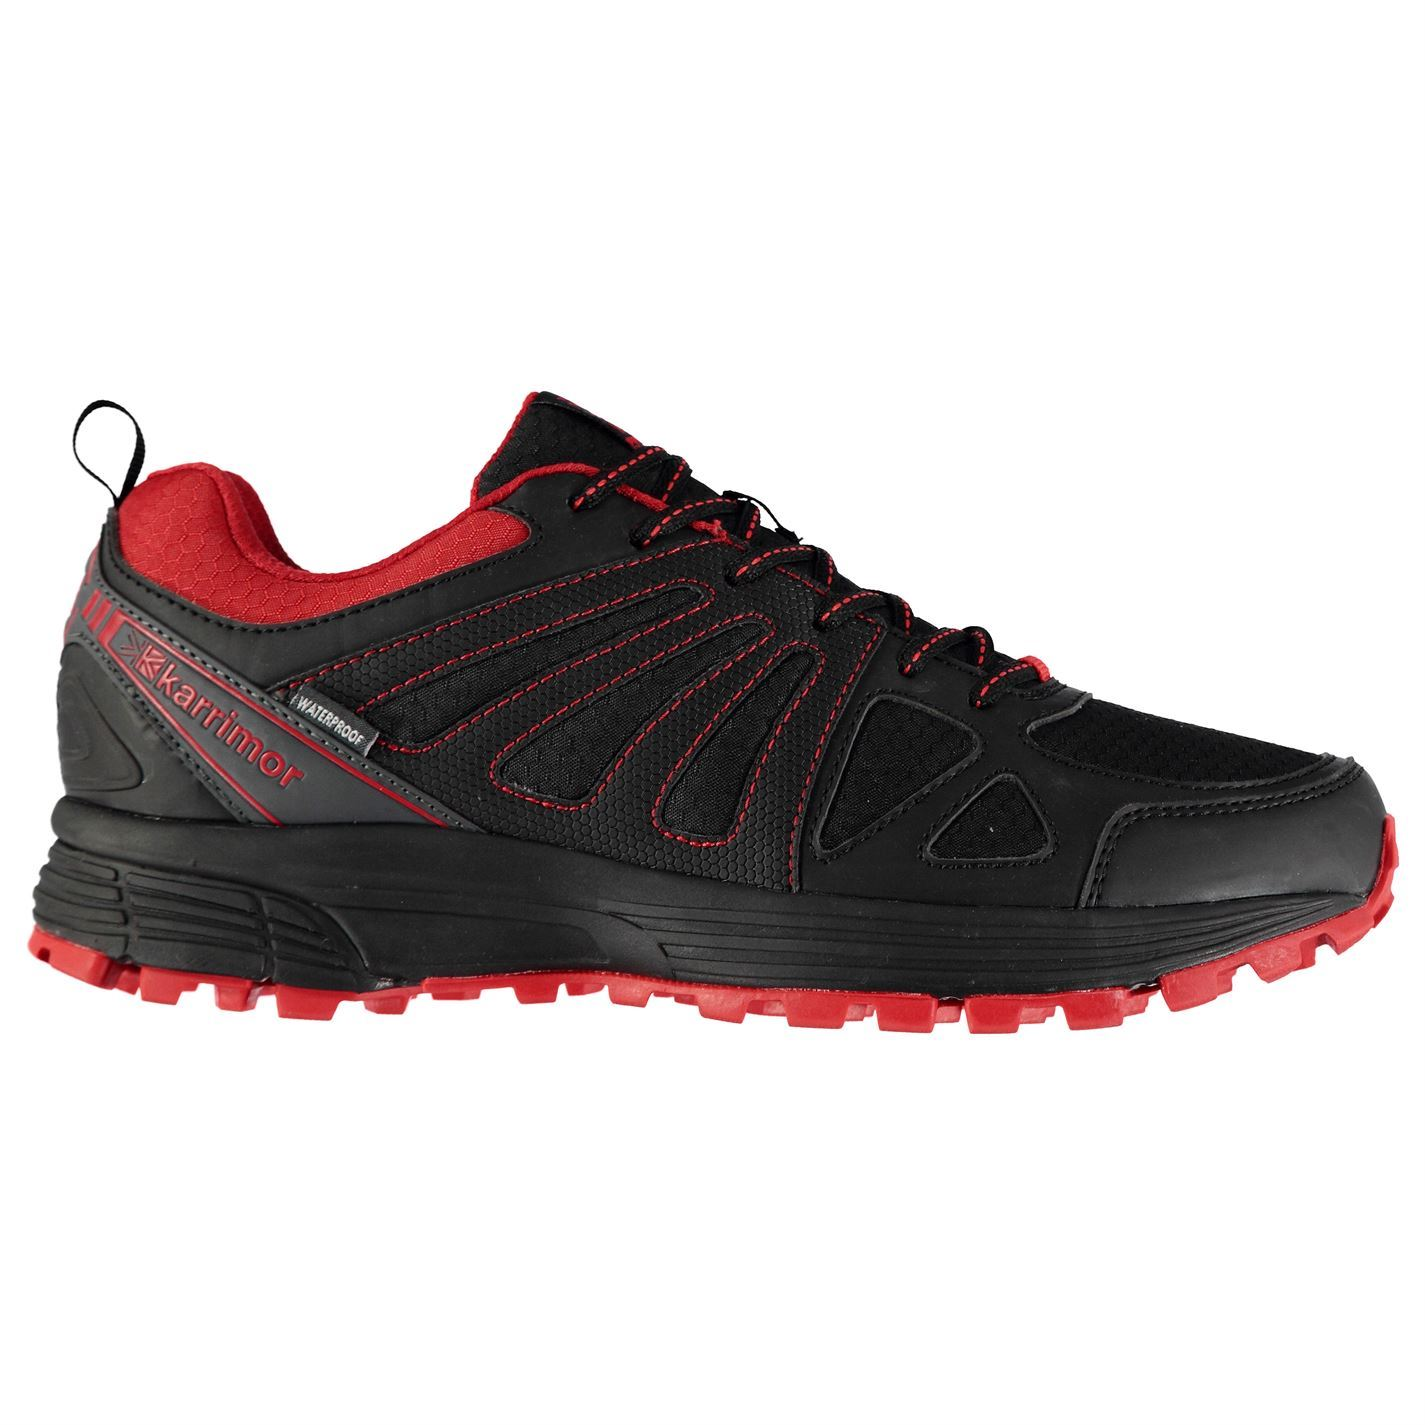 Karrimor X Trail Mens Running Shoes